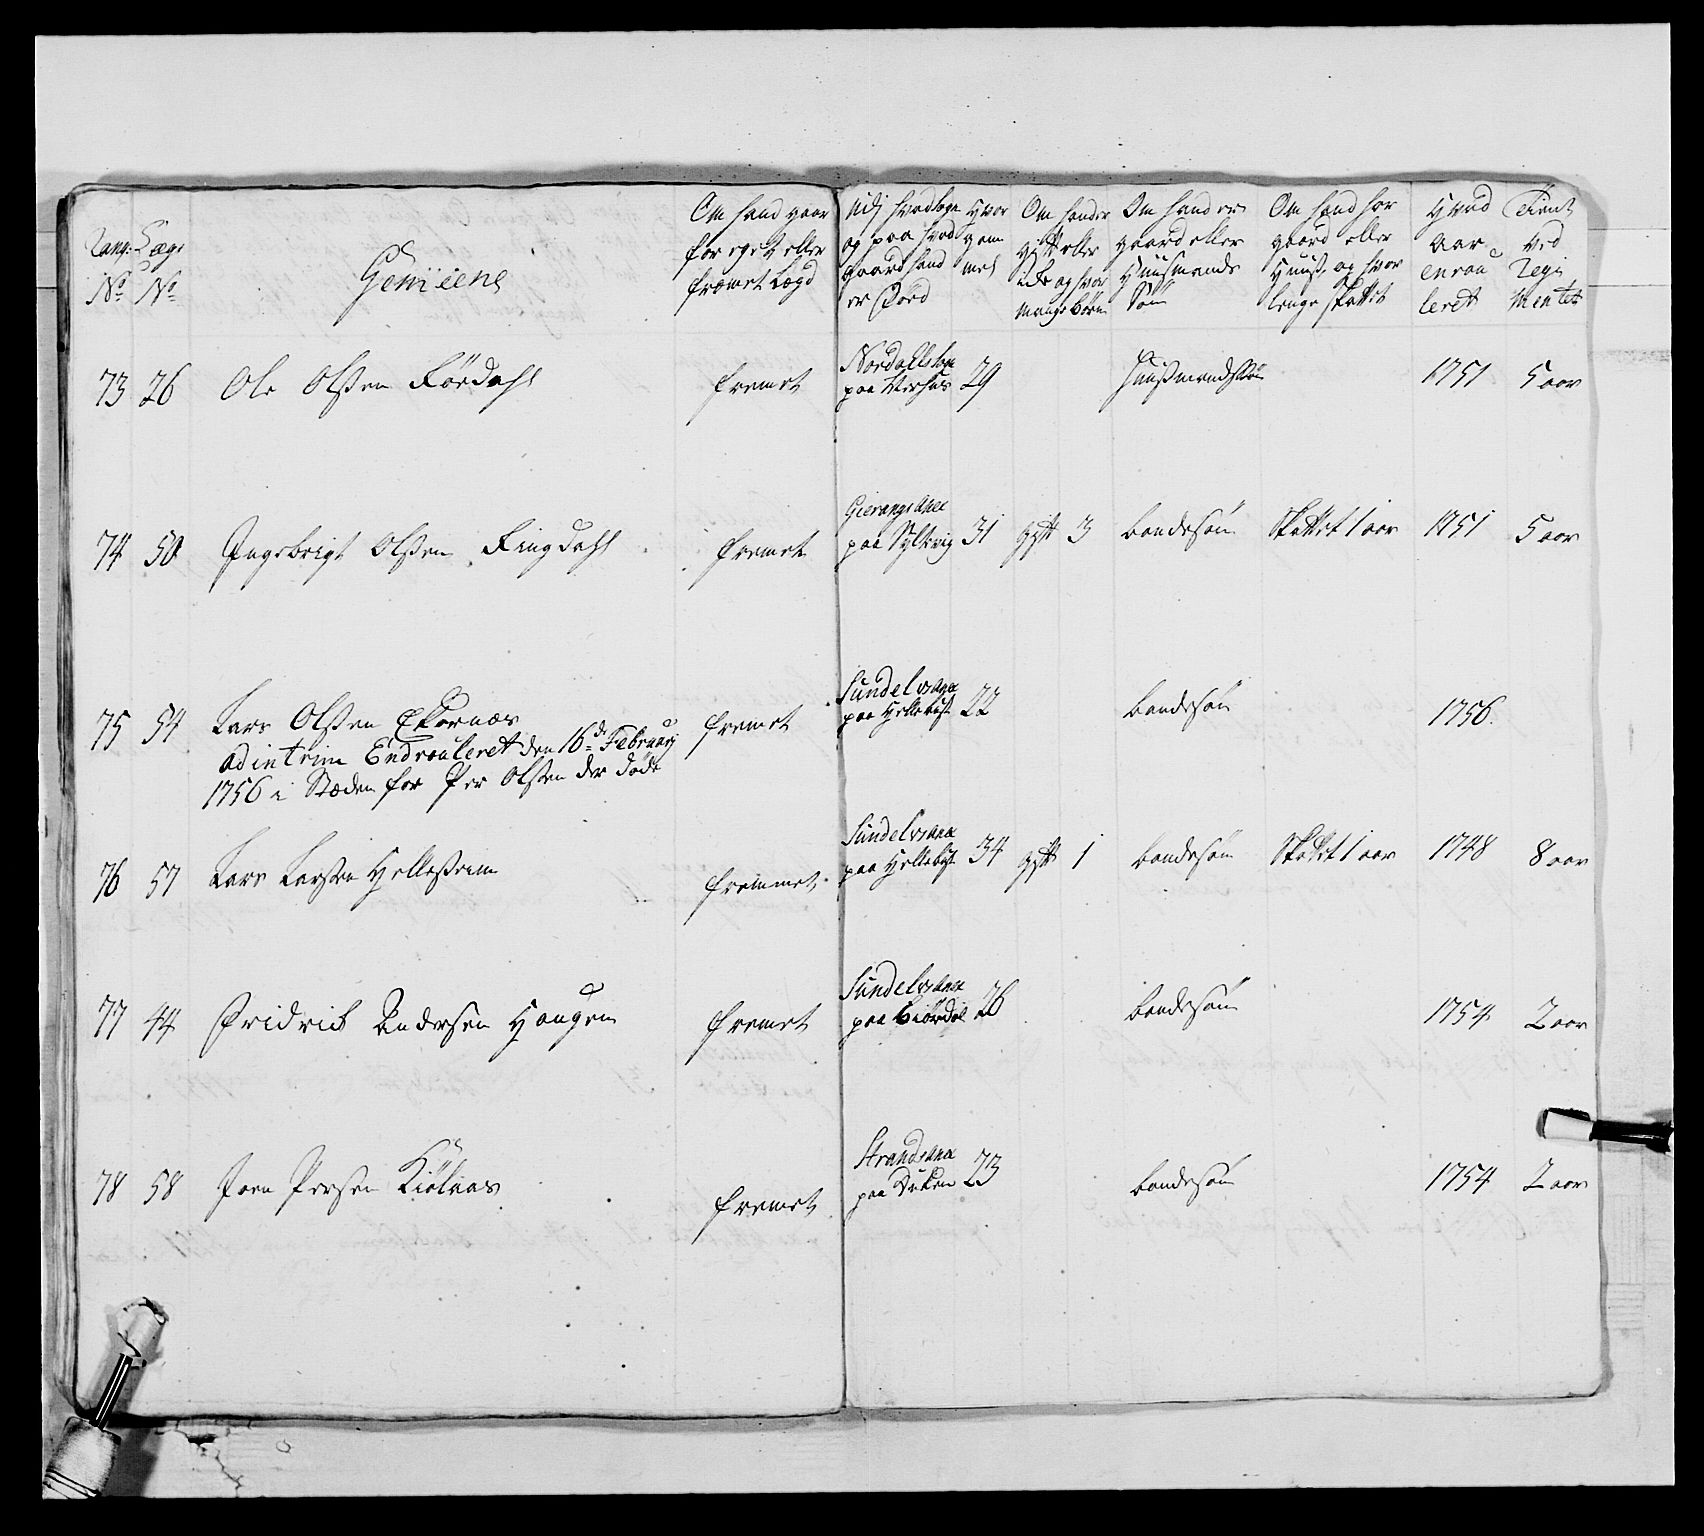 RA, Kommanderende general (KG I) med Det norske krigsdirektorium, E/Ea/L0517: 1. Bergenhusiske regiment, 1742-1756, s. 255